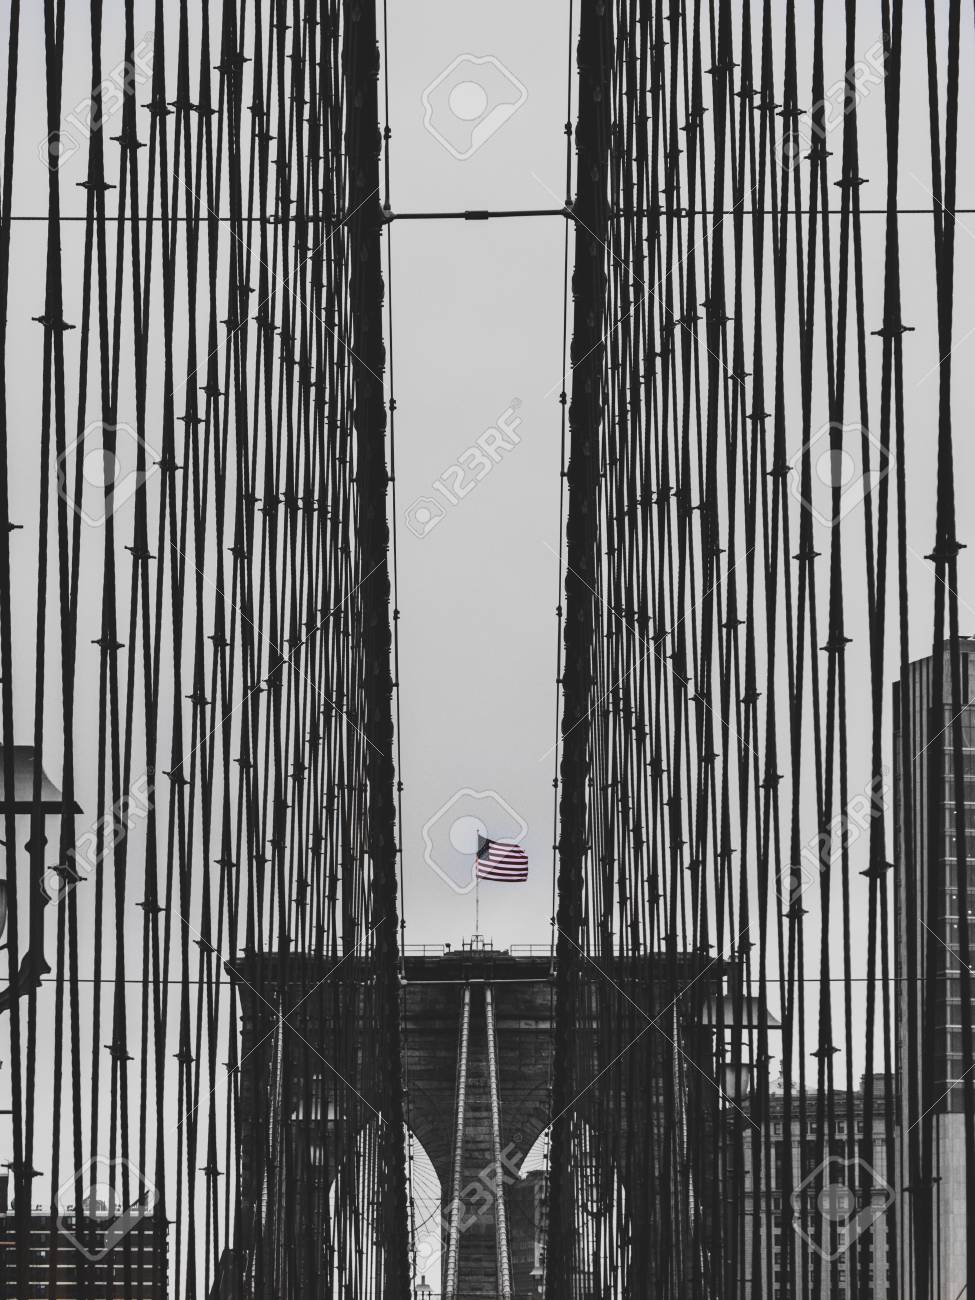 brooklyn bridge black and white with american flag in new york sad mood USA - 108906197